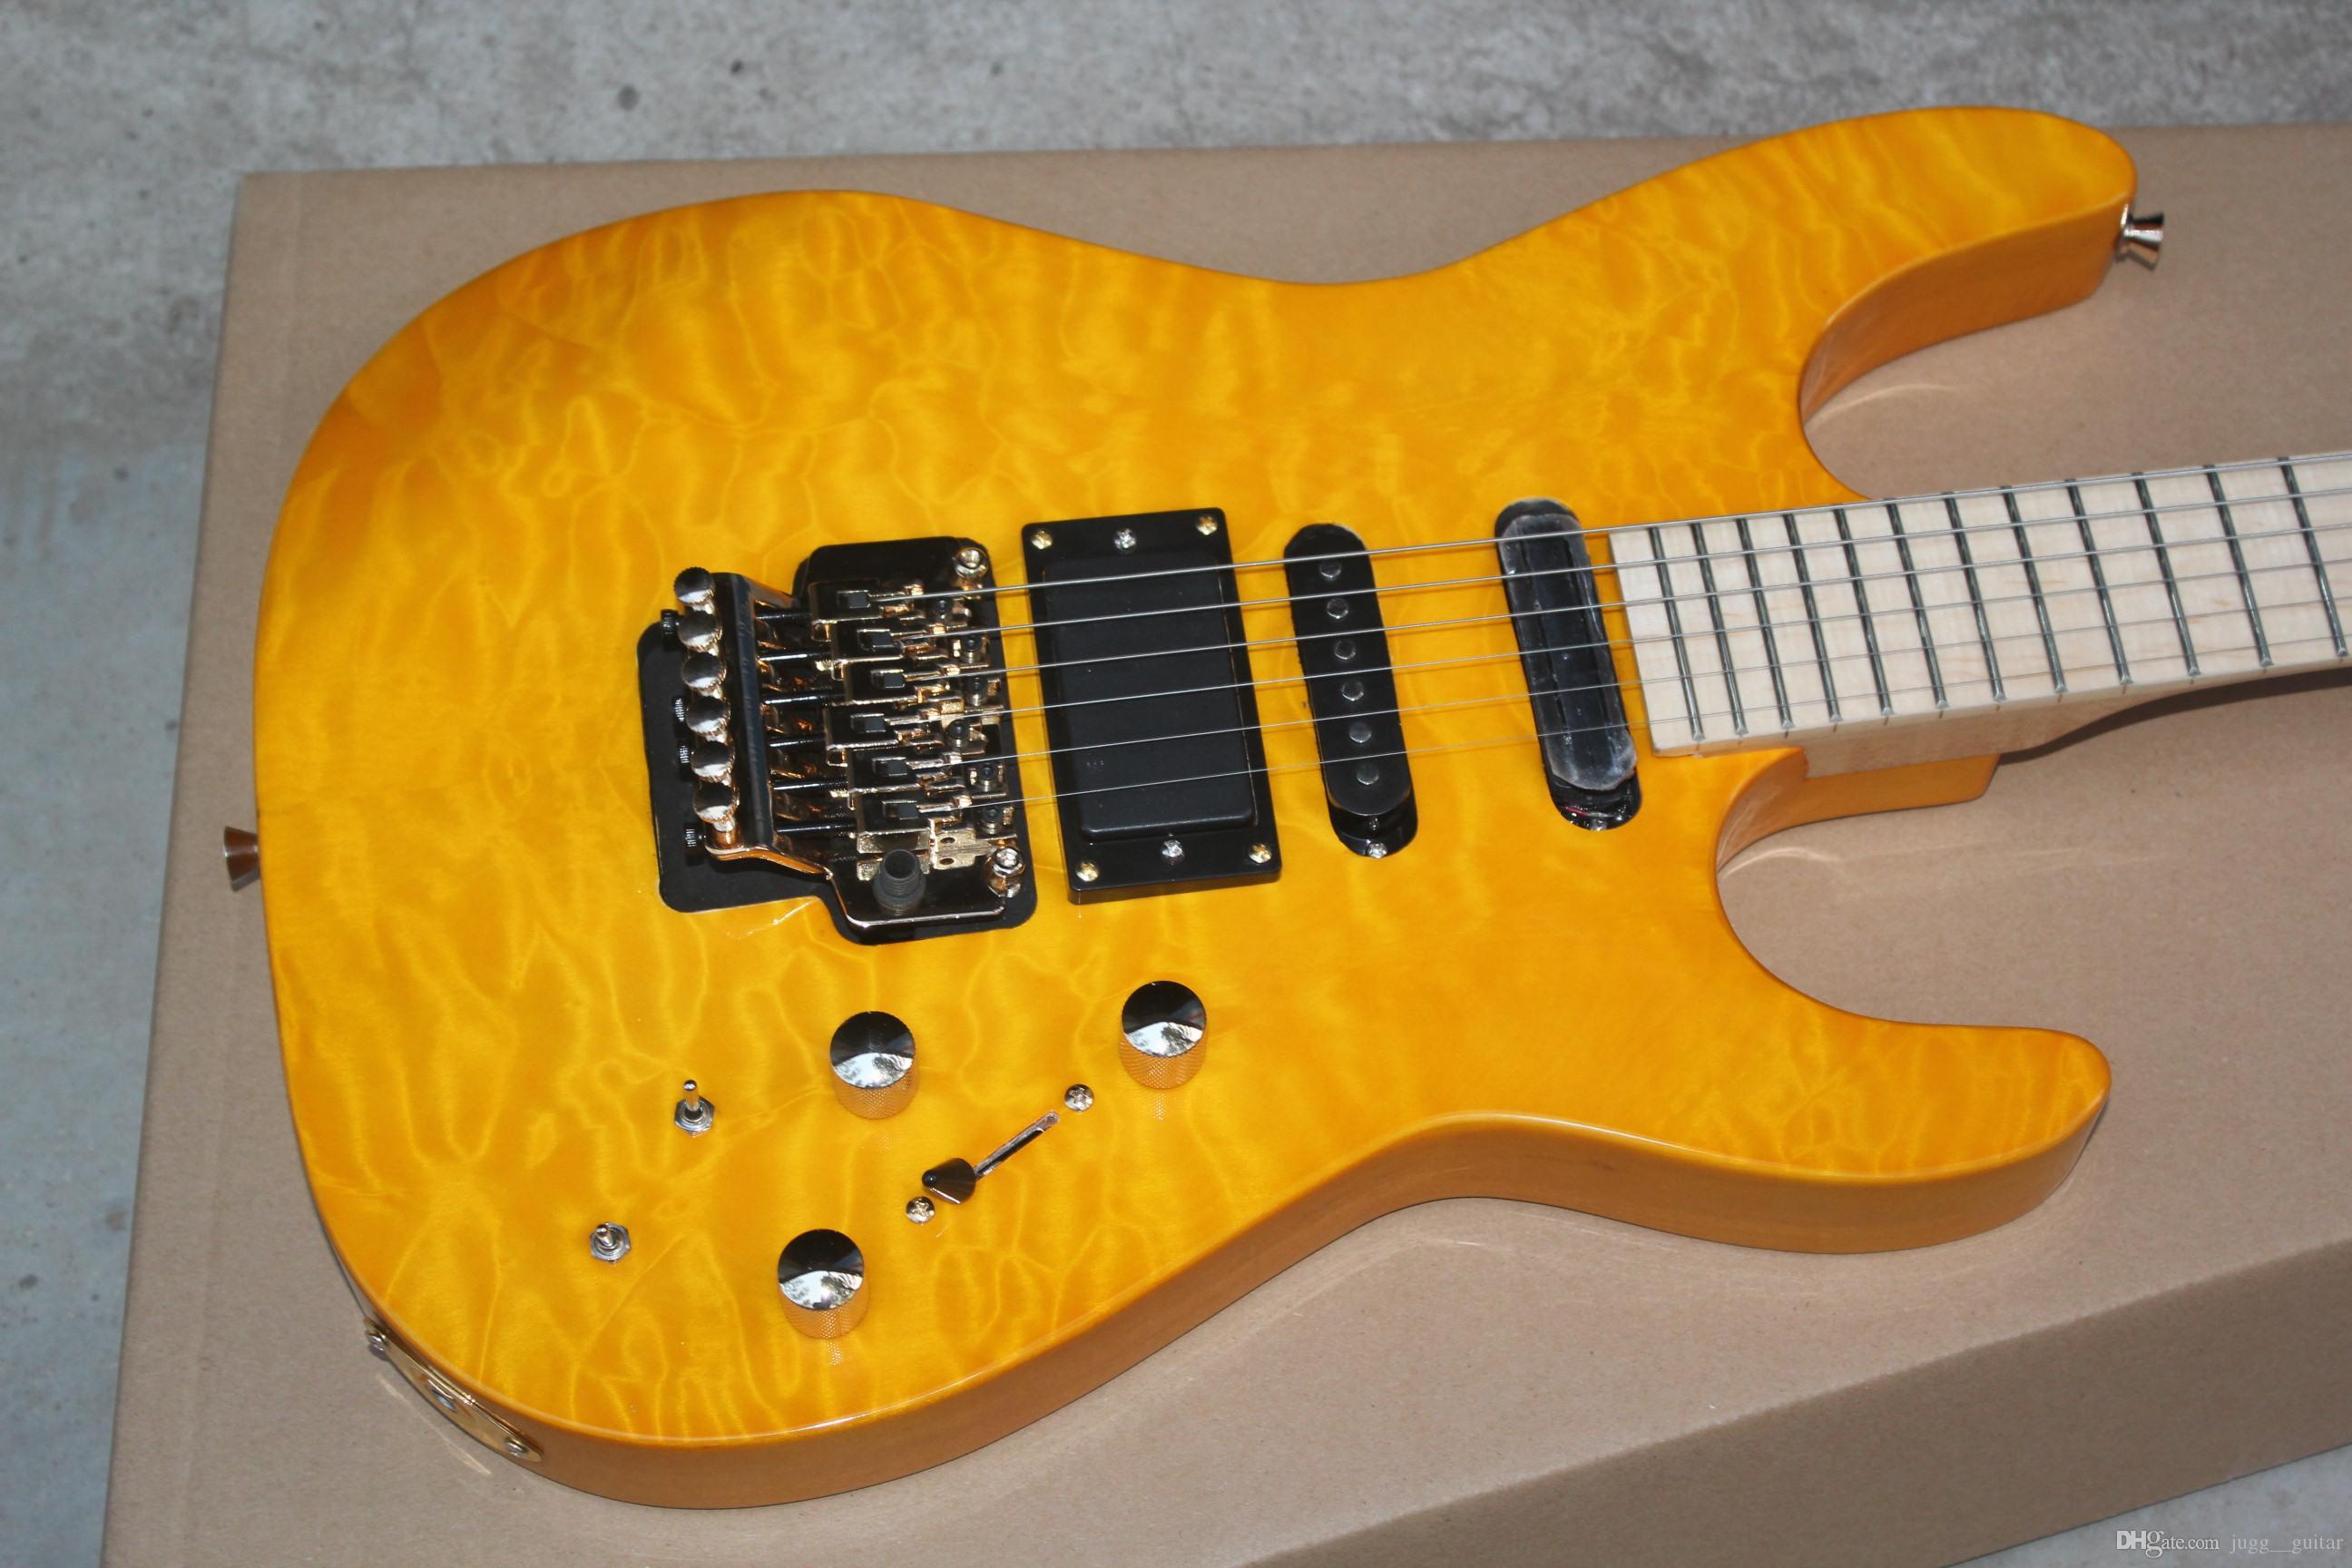 limited edition jackson yellow amber qulit maple top electric guitar floyd rose tremolo bridge. Black Bedroom Furniture Sets. Home Design Ideas